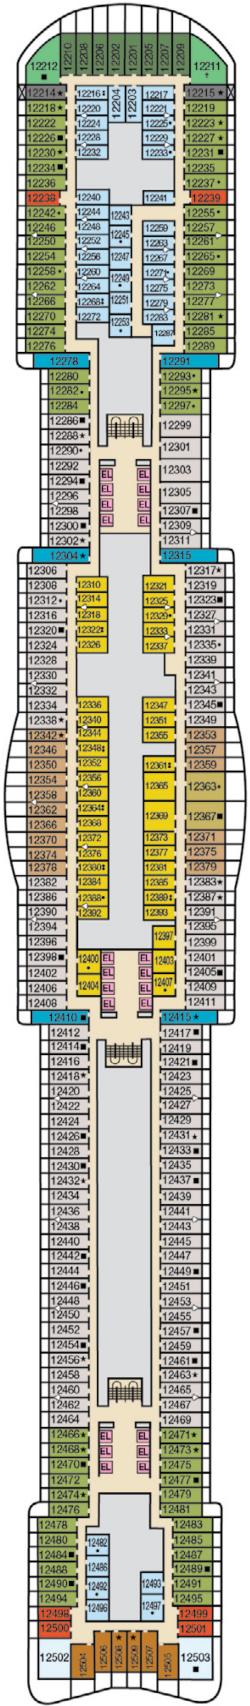 Mardi Gras Deck 12 Deck Plan